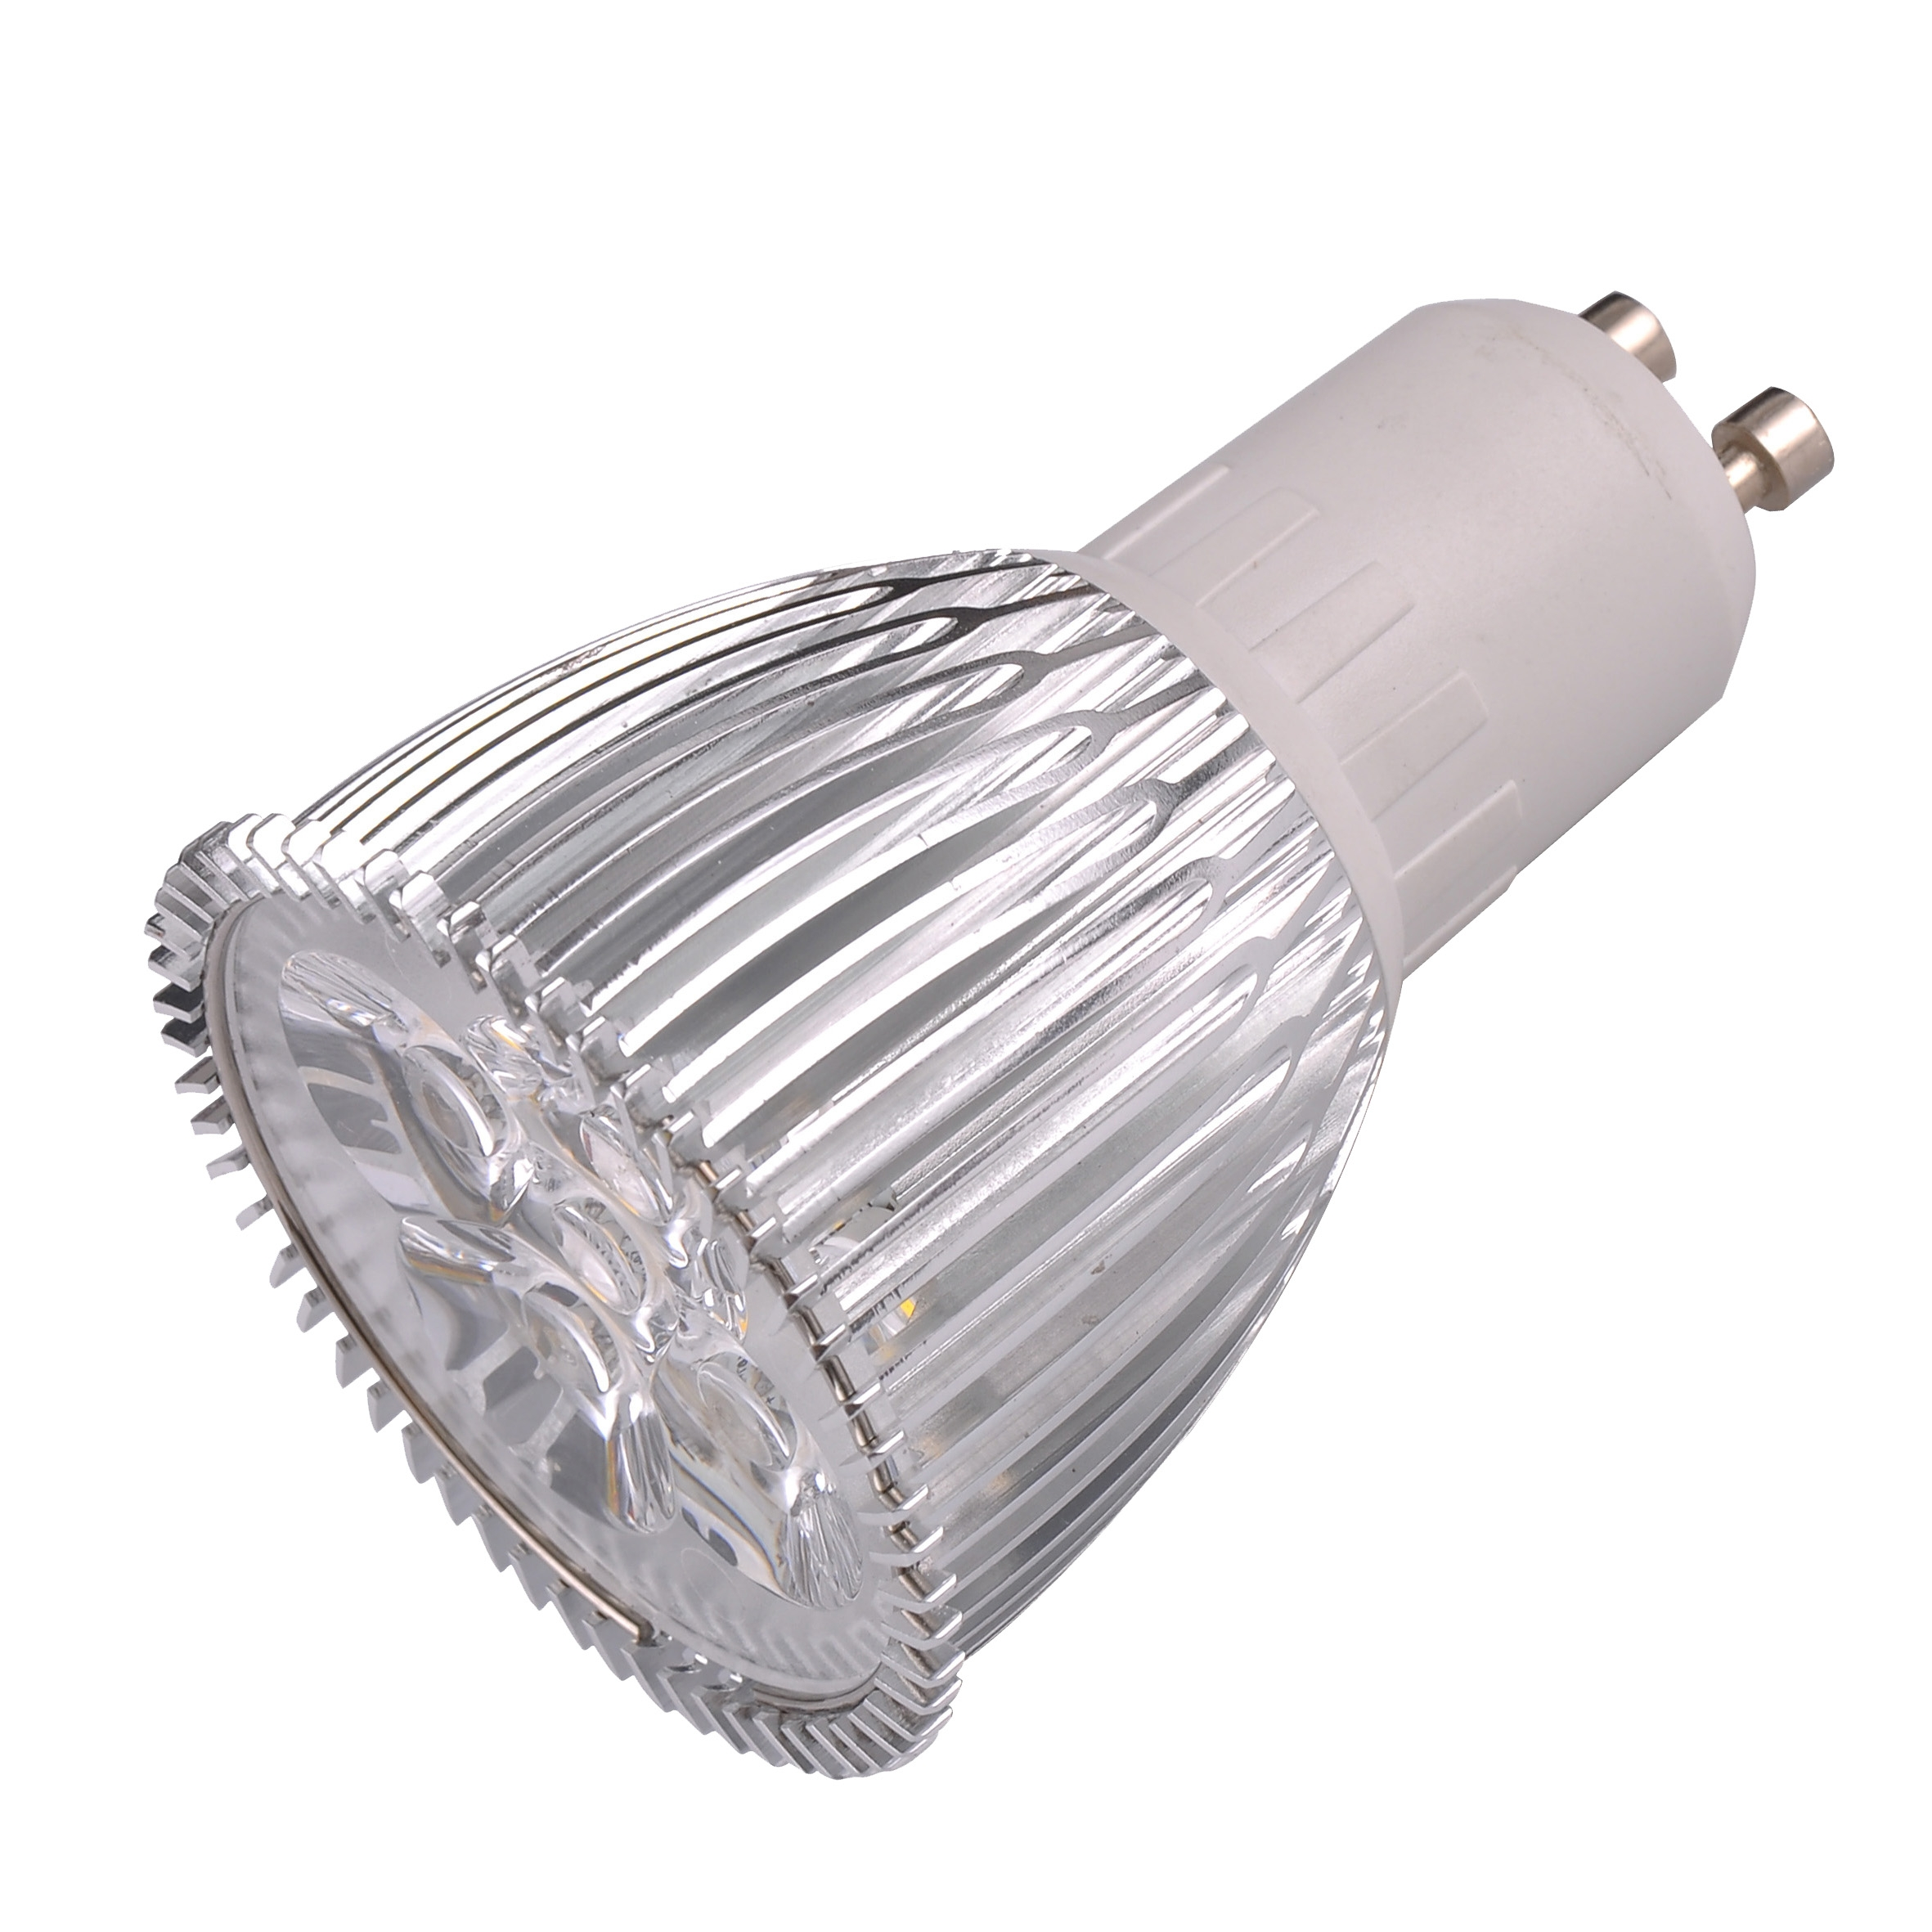 Ampoules GU10 5 watts